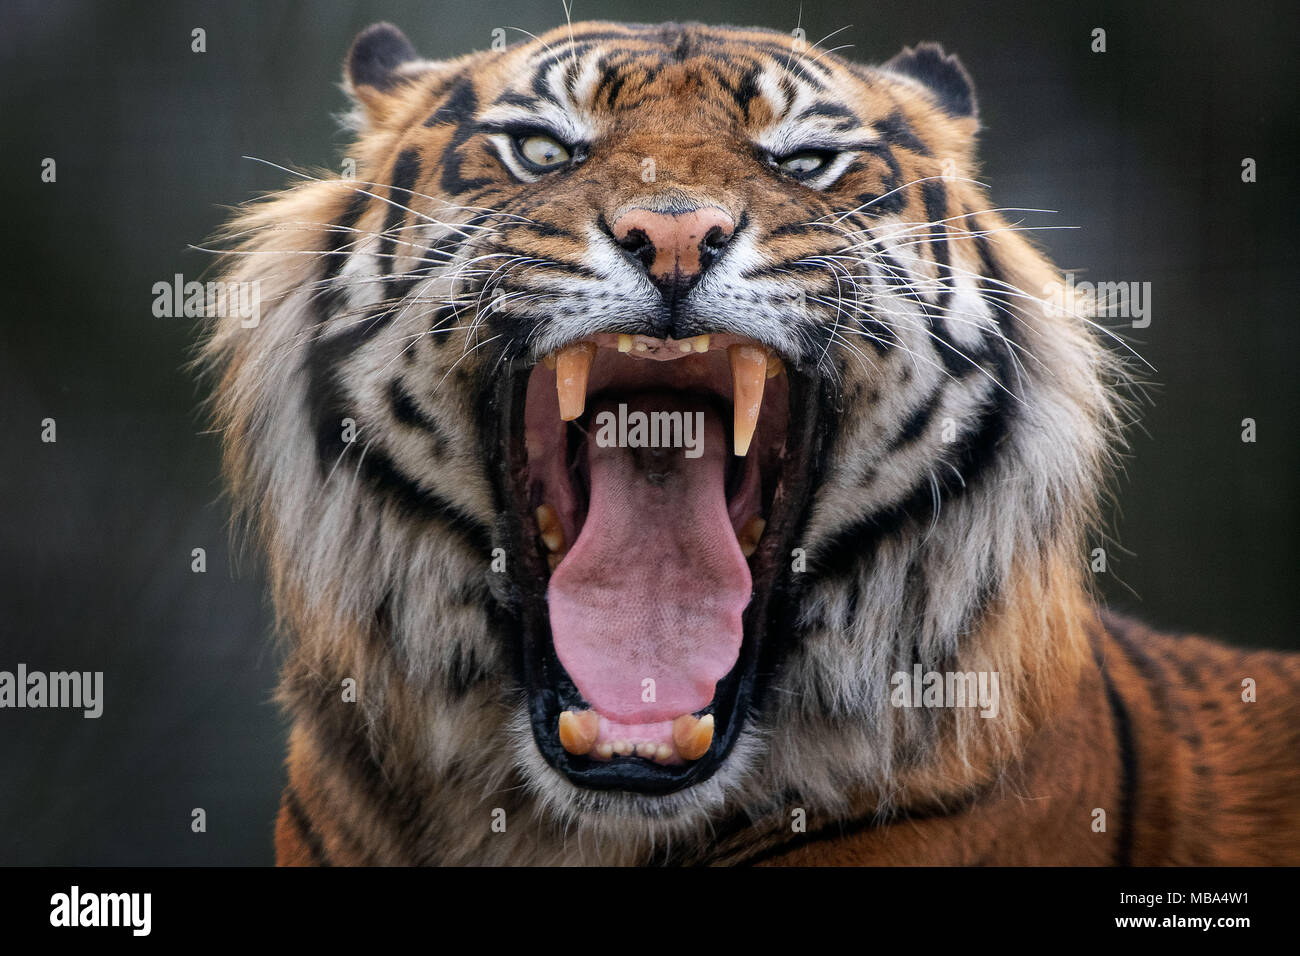 Edinburgh UK Apr 09 2018; Edinburgh Zoo Sumatran Tiger which is kept as part of a captive population safetynet against the extinction. credit steven scott taylor / alamy live news - Stock Image